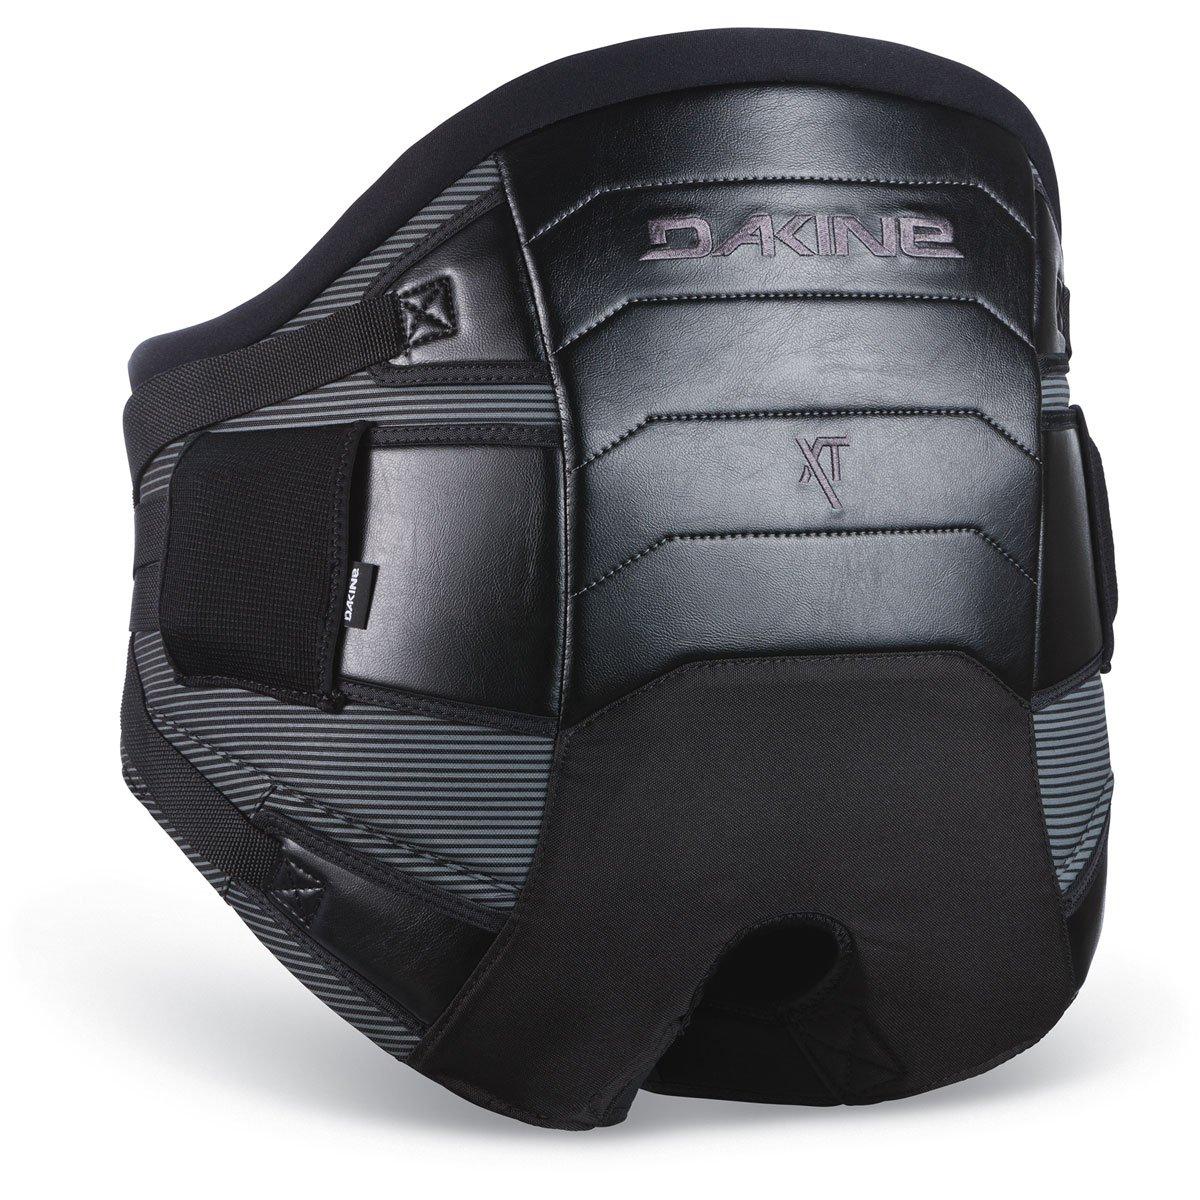 Dakine Men's XT Seat Windsurf Harness, Black, L by Dakine (Image #1)